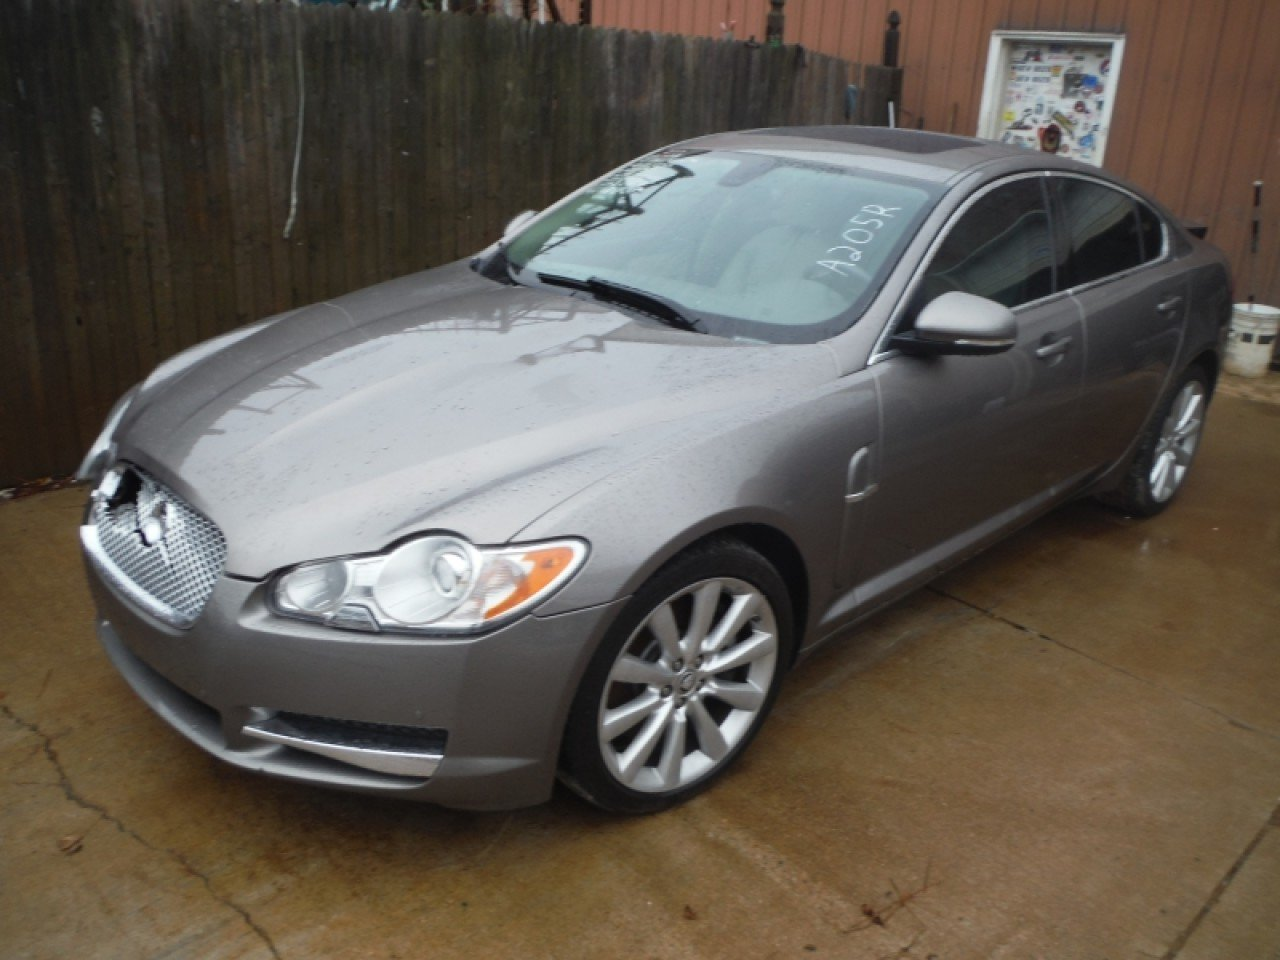 2010 jaguar xf premium for sale near bedford, virginia 24174